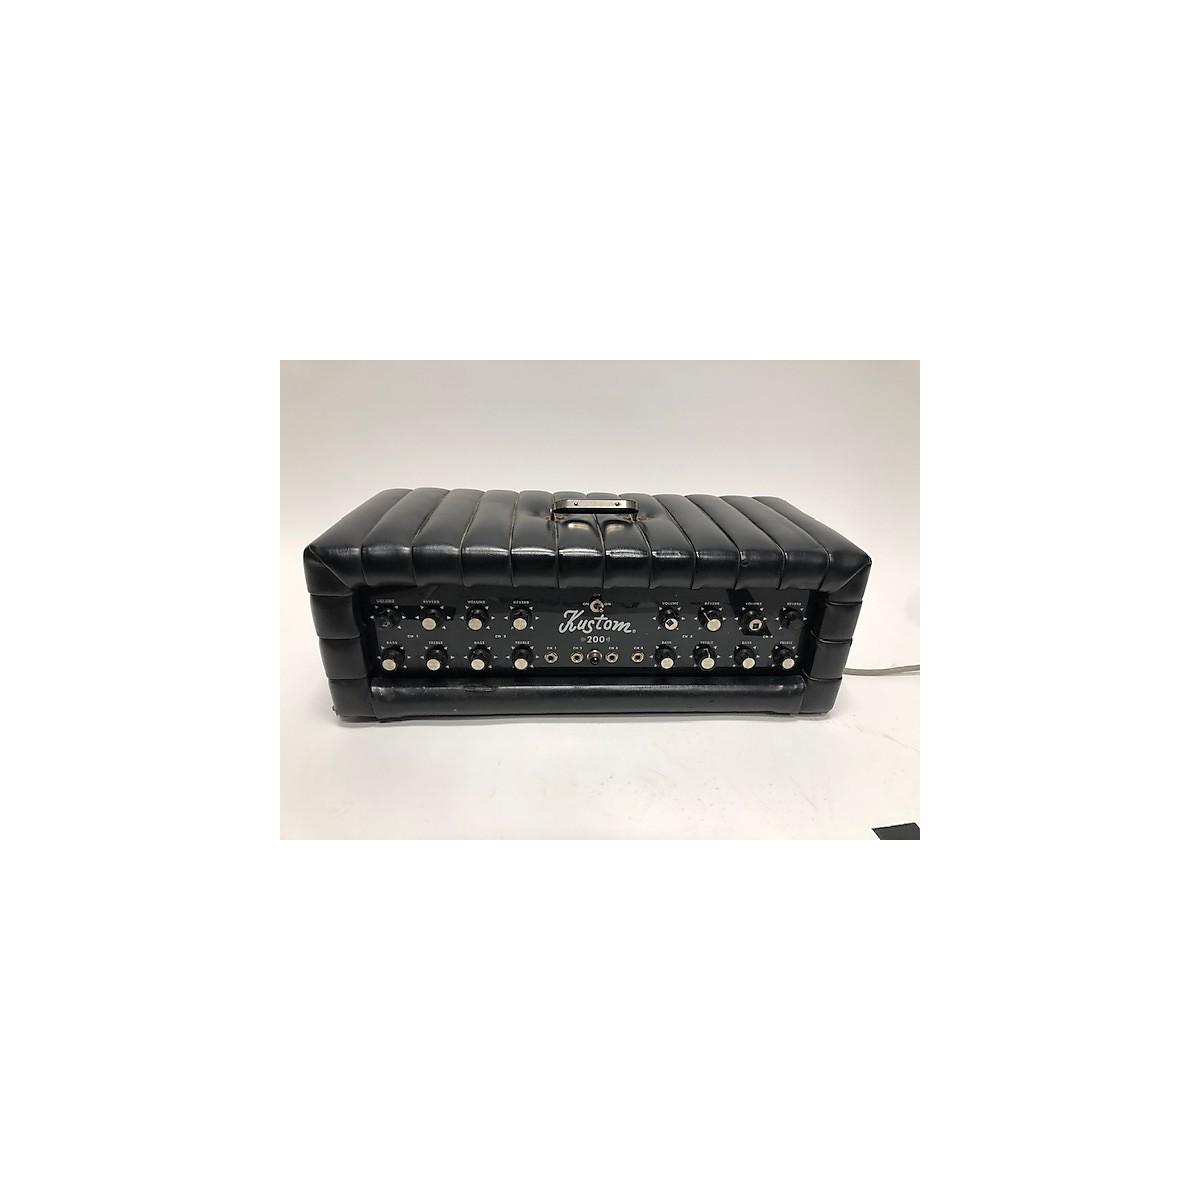 Kustom 1960s 200 PA Black Solid State Guitar Amp Head